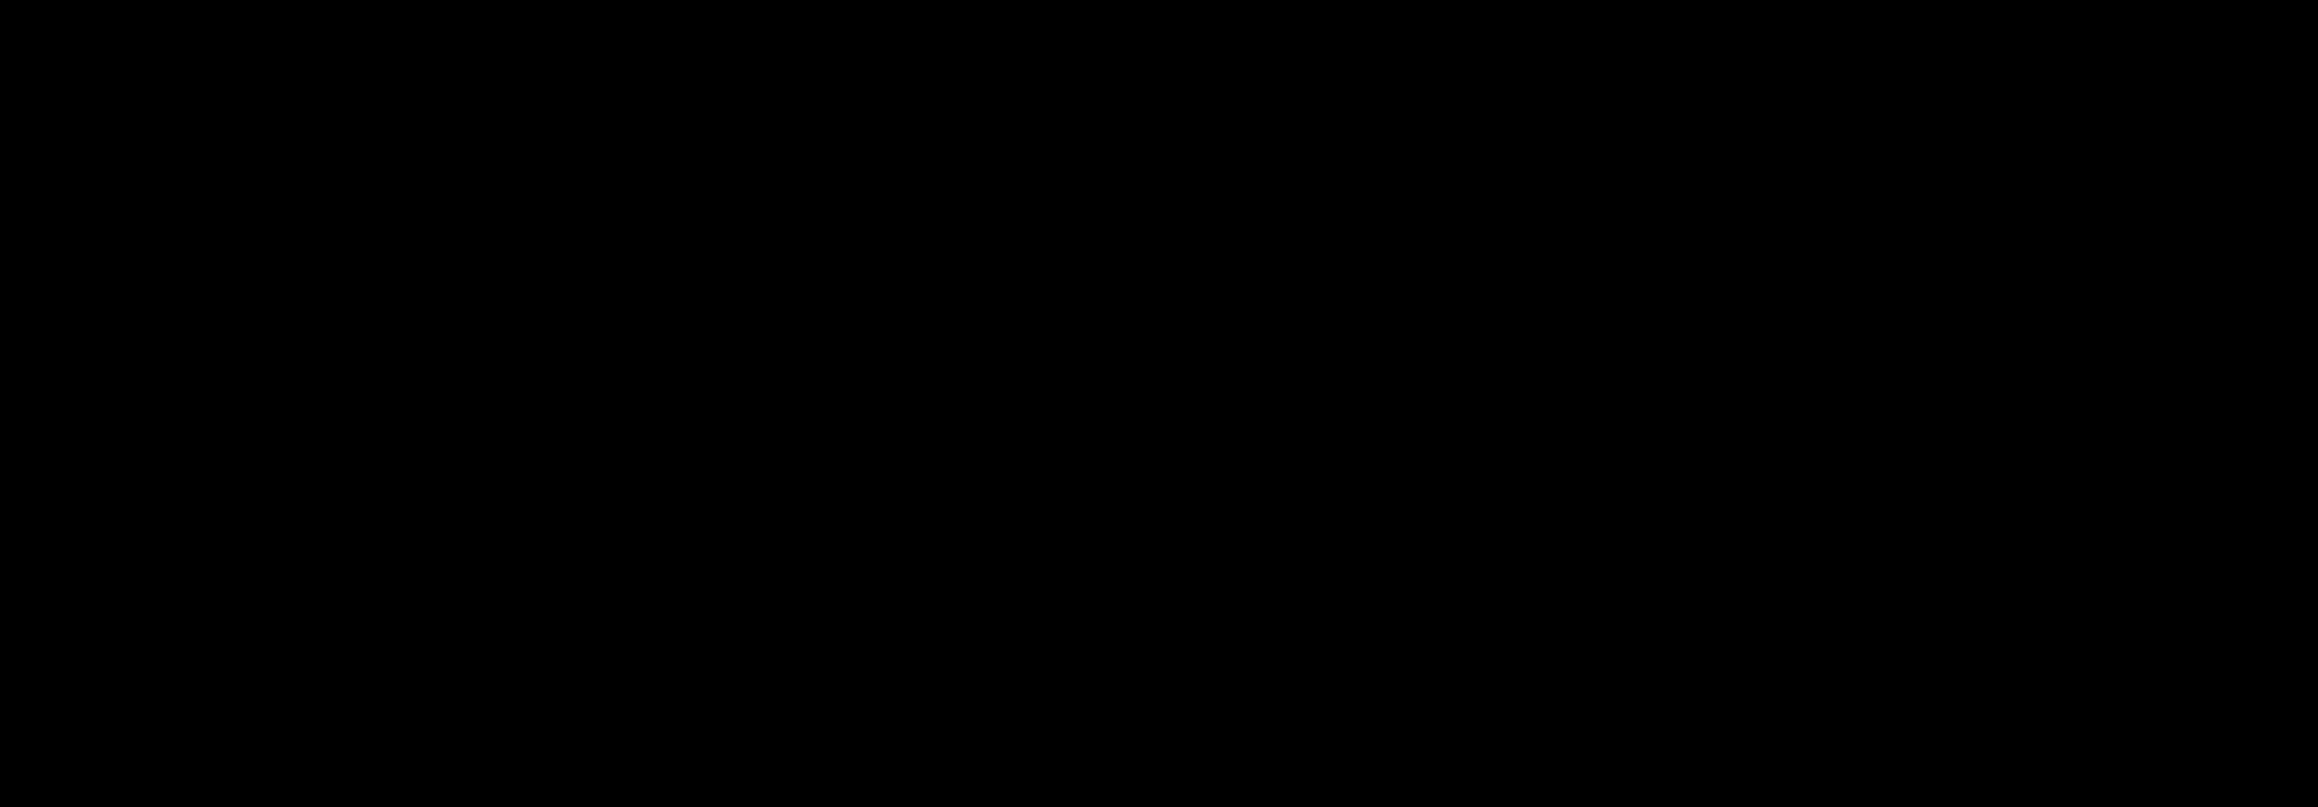 rac-Silodosin